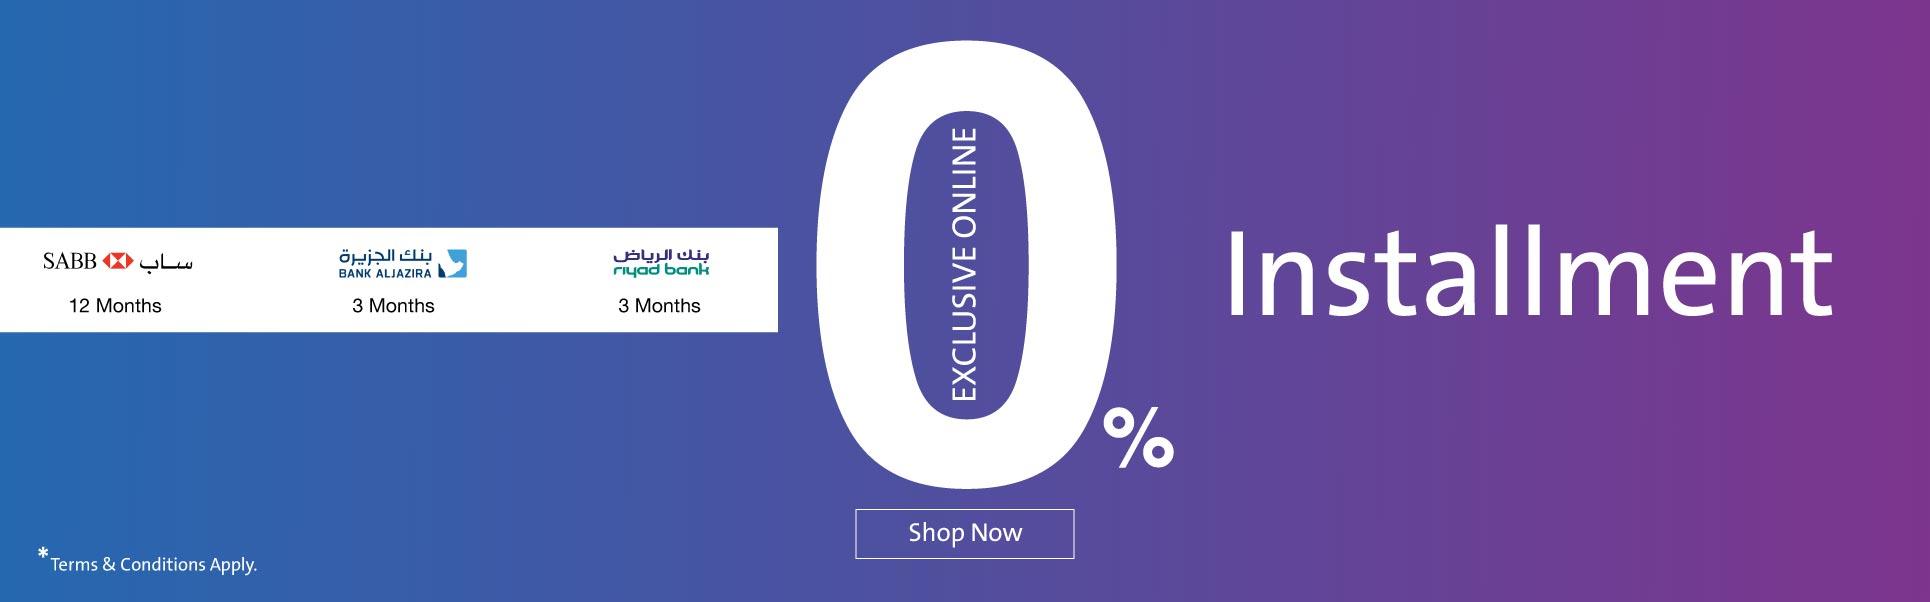 Ahmed Abdulwahed e-commerce Co  in Saudi Arabia | Buy Online